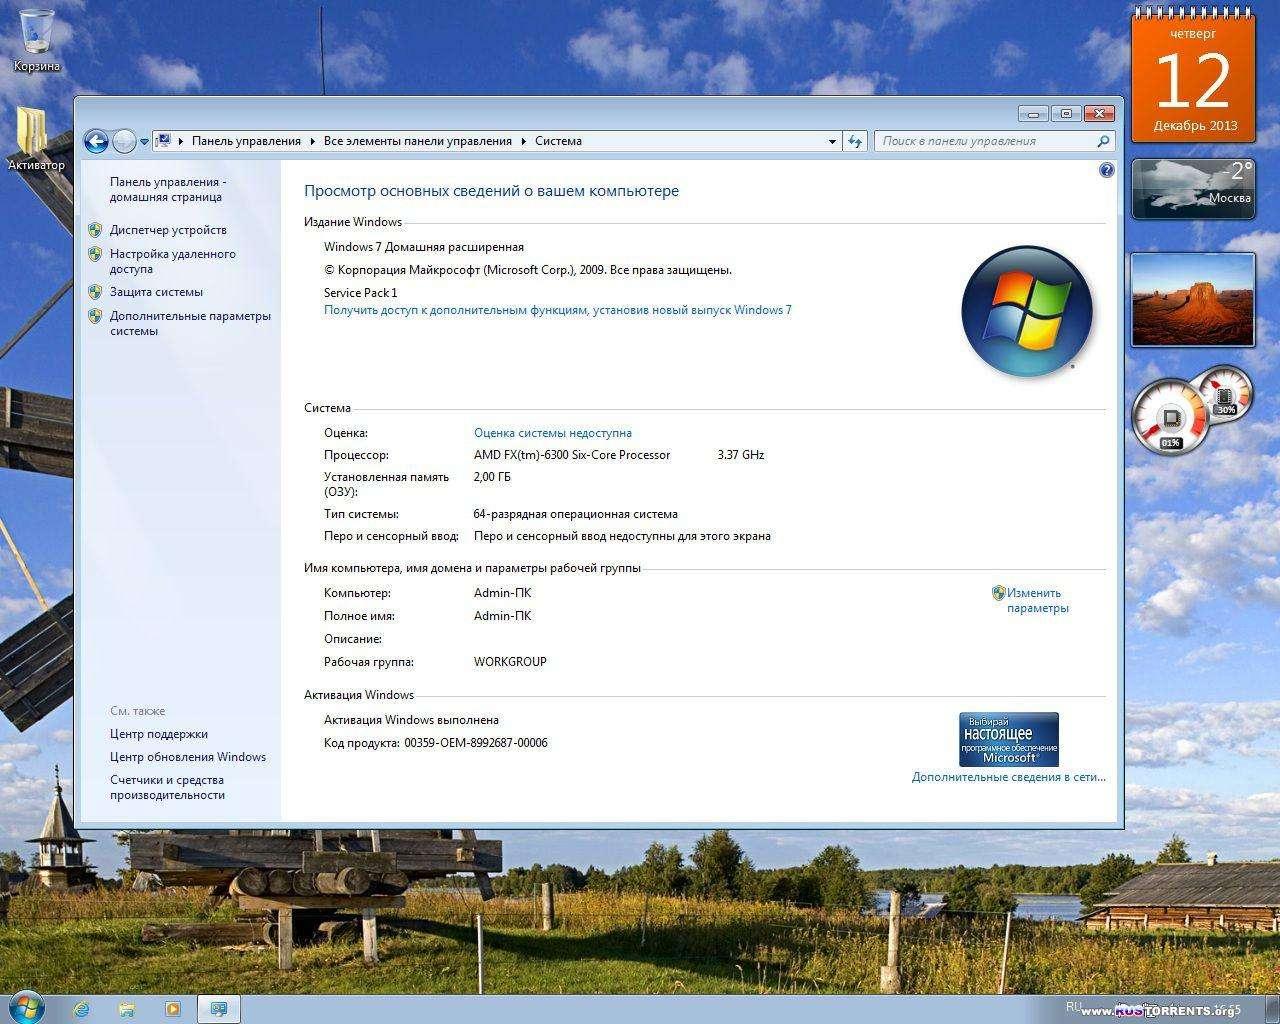 Windows 7 Home Premium SP1 x64 v.6.1 by vladios13 RUS